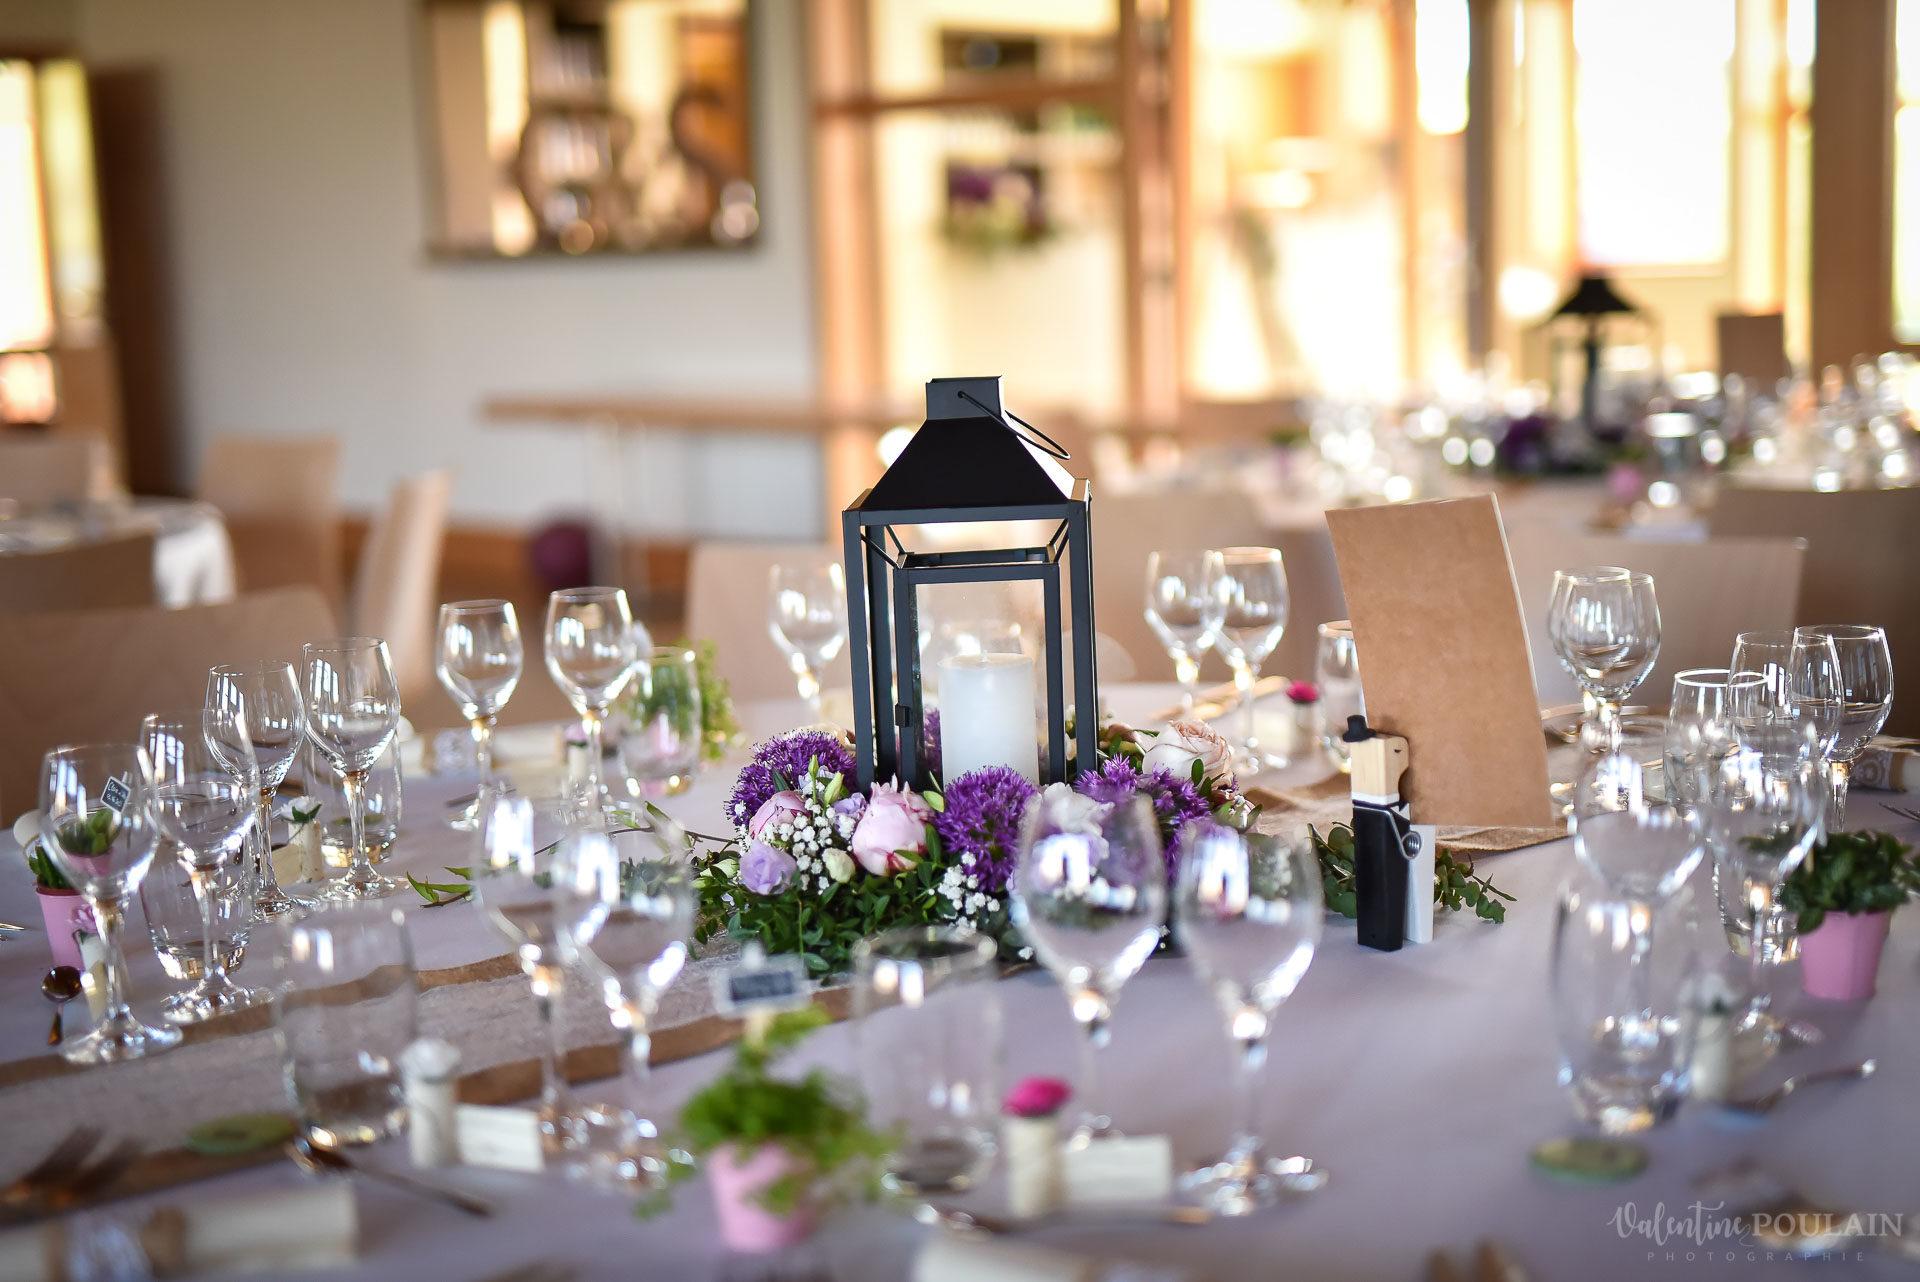 Mariage convivial Saverne - Valentine Poulain table